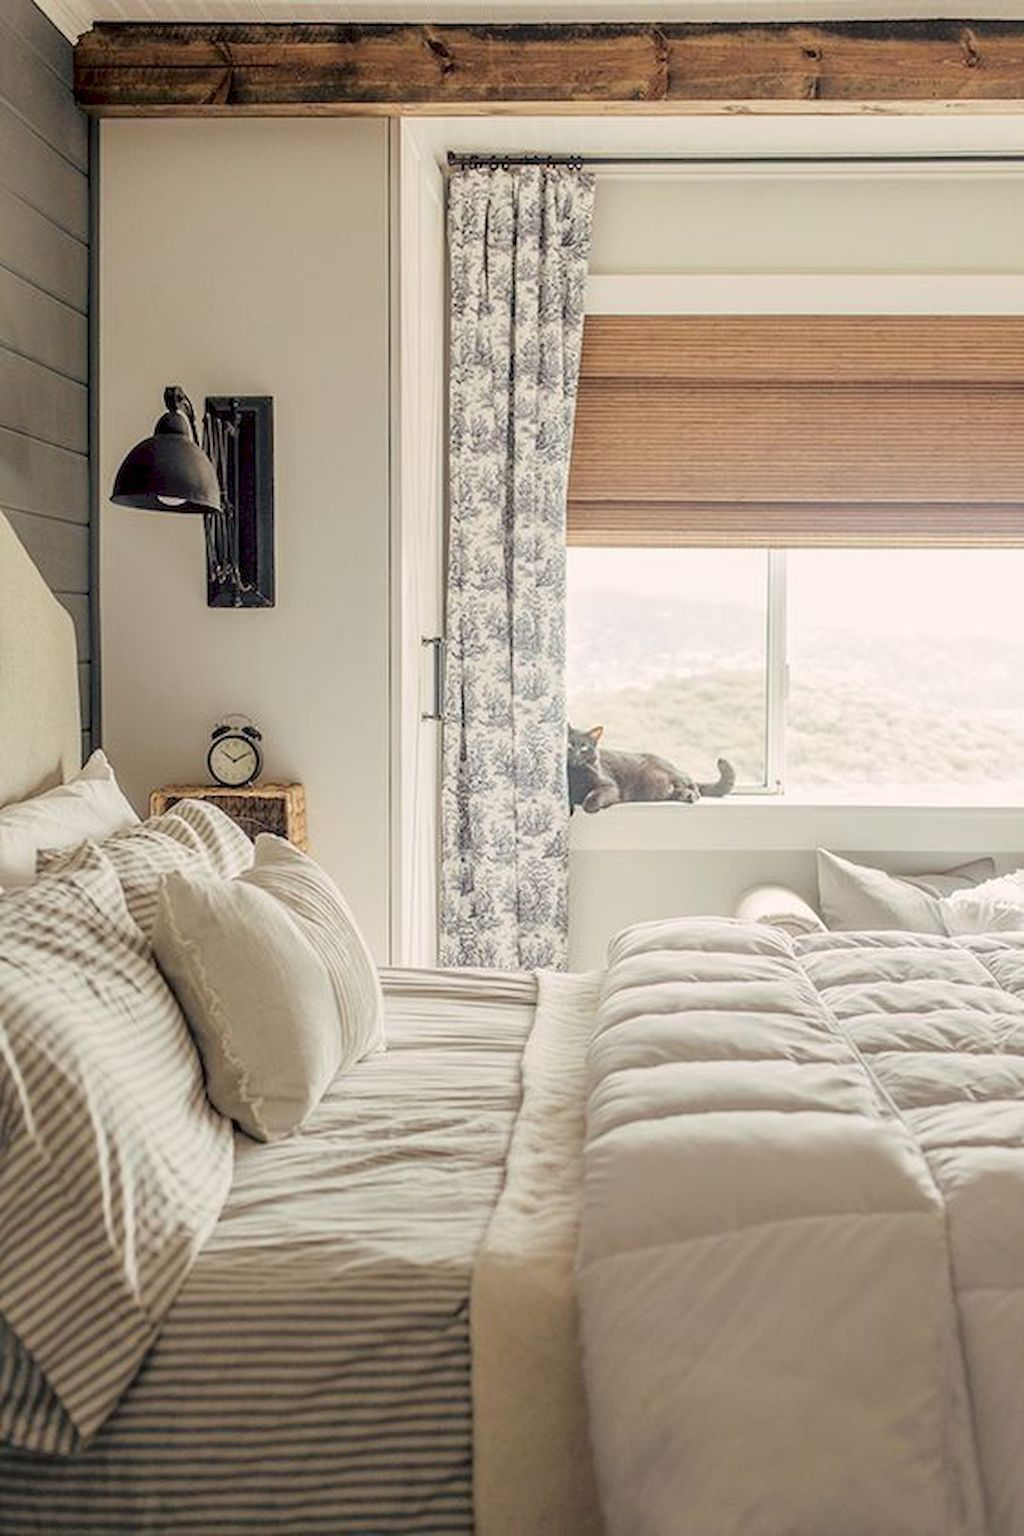 65 inspiring modern farmhouse bedroom decor ideas with